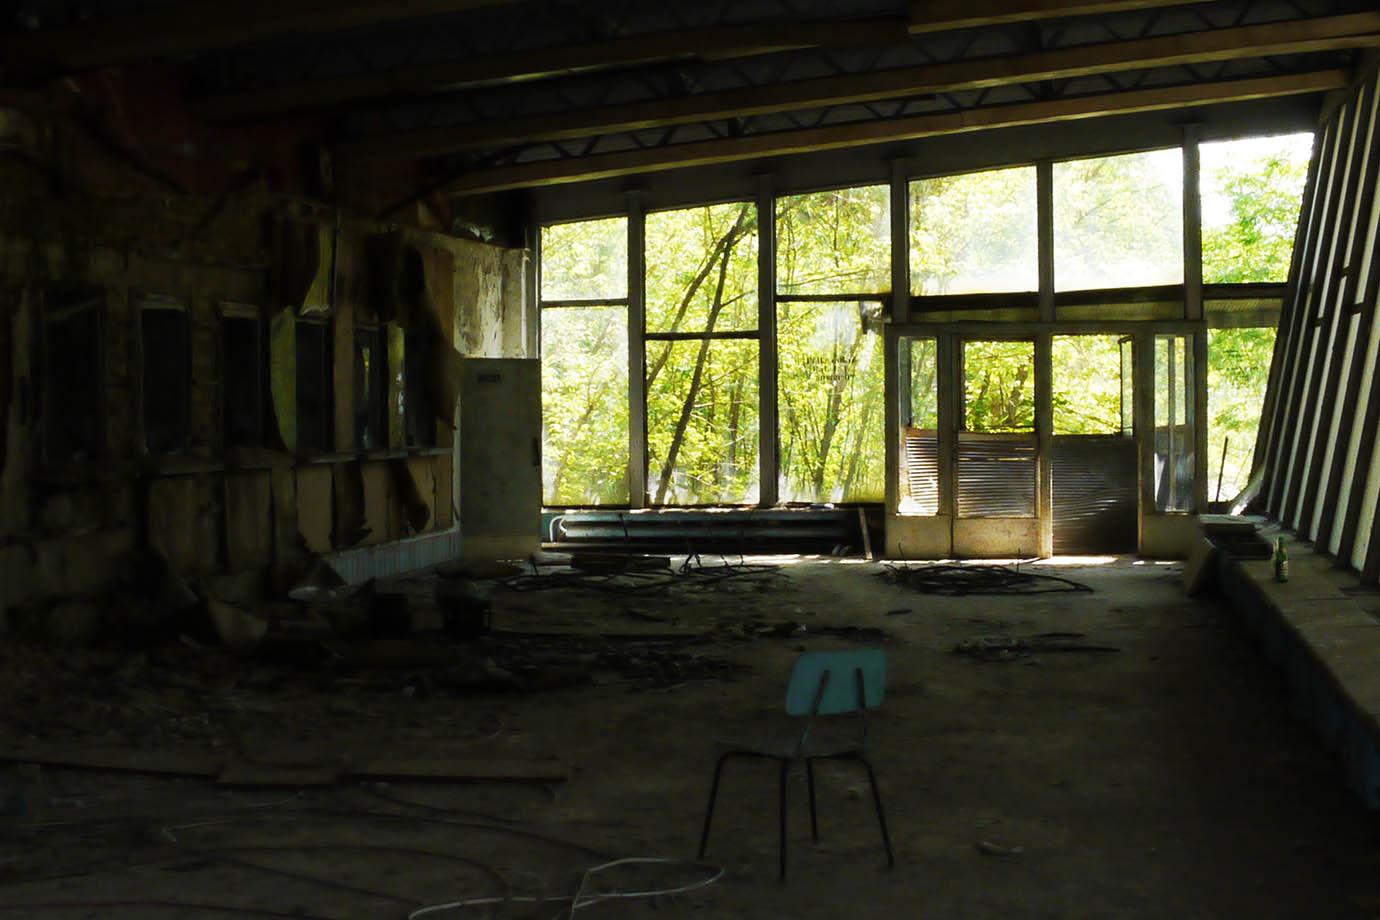 chernobyl-disaster7